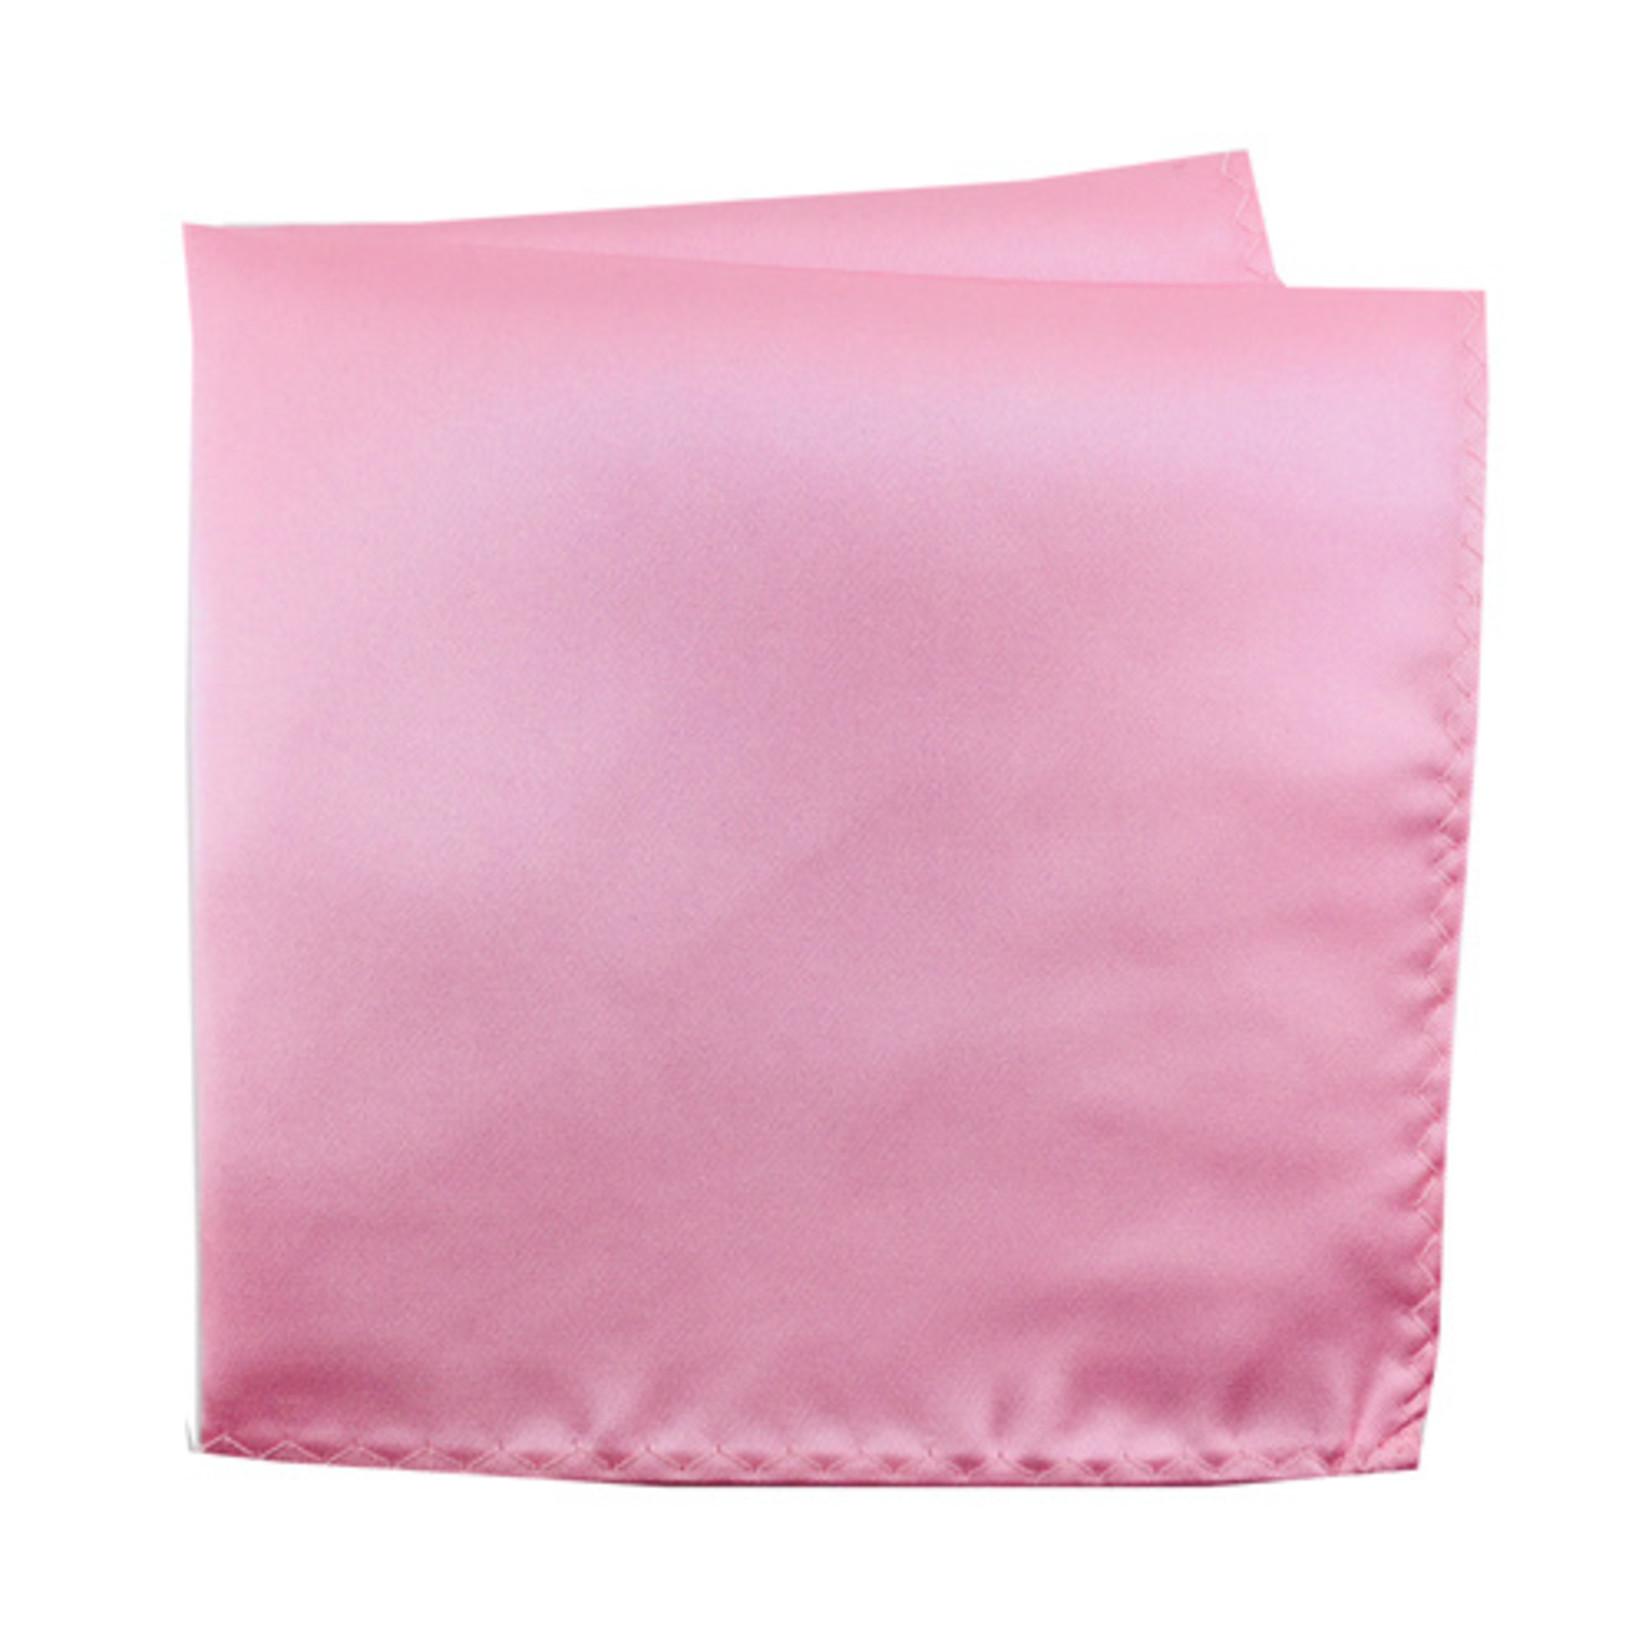 Knotz M100PSQ-42 Solid Light Pink Pocket Square